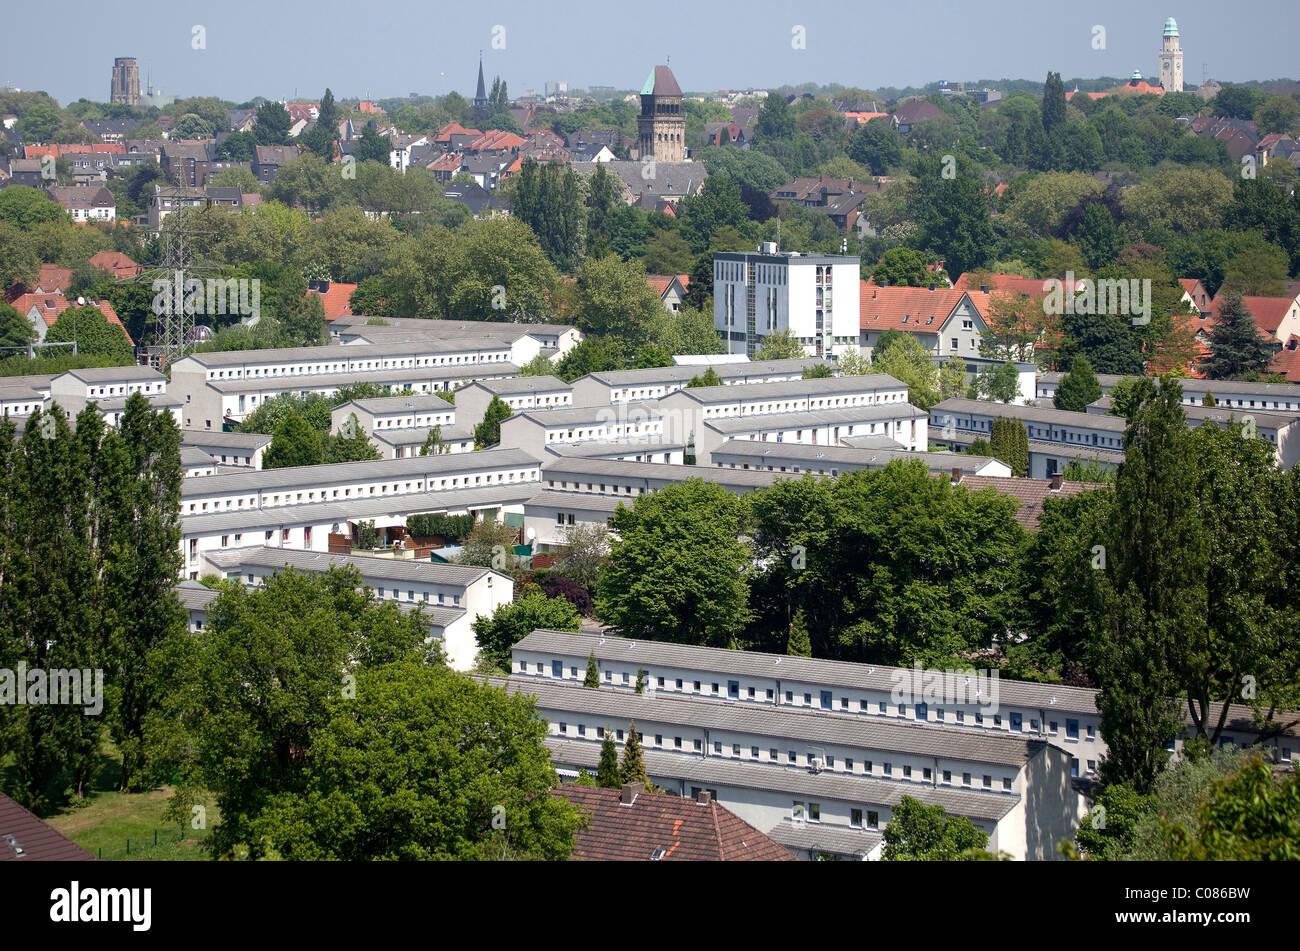 Siedlung Schuengelberg company town, International Building Exhibition Emscher Park, Gelsenkirchen, Ruhrgebiet region - Stock Image